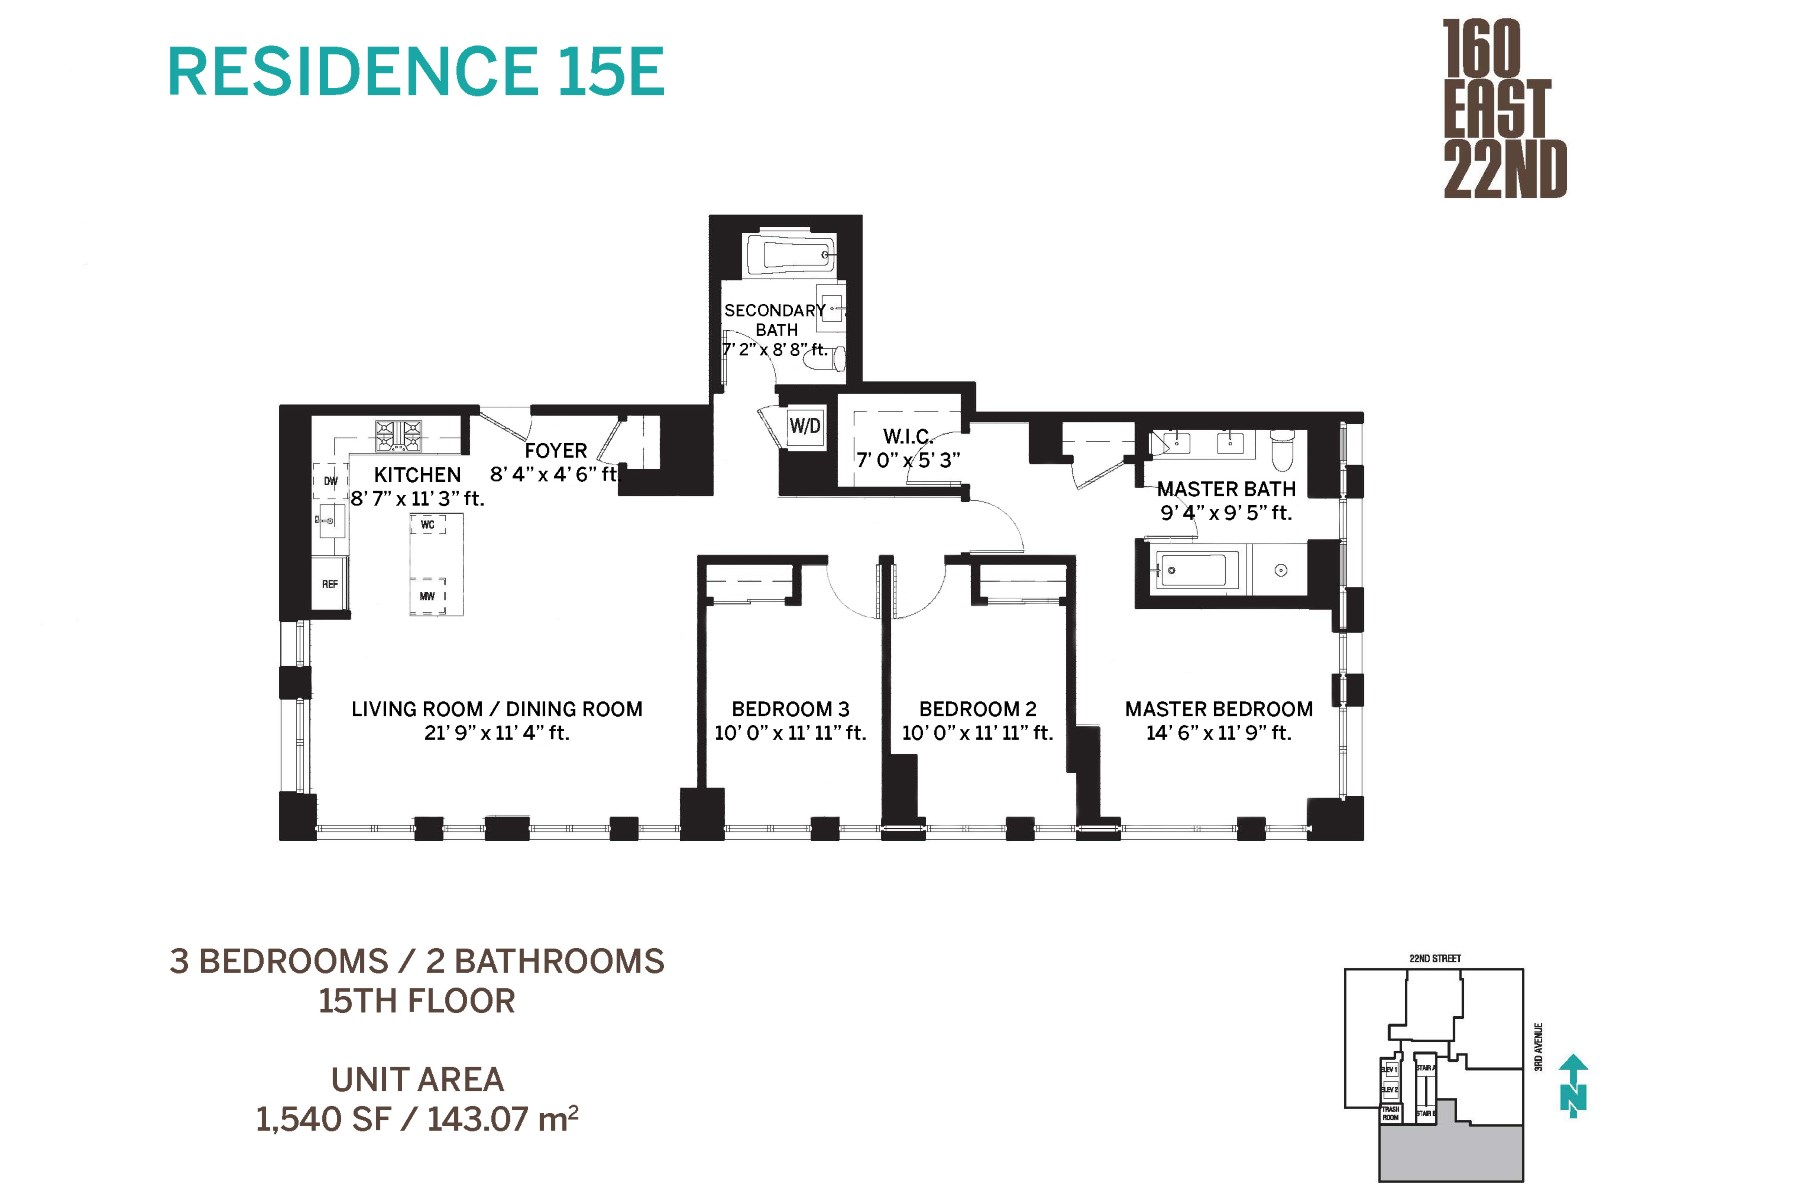 Condominium for Sale at 160 East 22nd Street, Apt. 15E 160 East 22nd Street Apt. 15E New York, New York 10011 United States